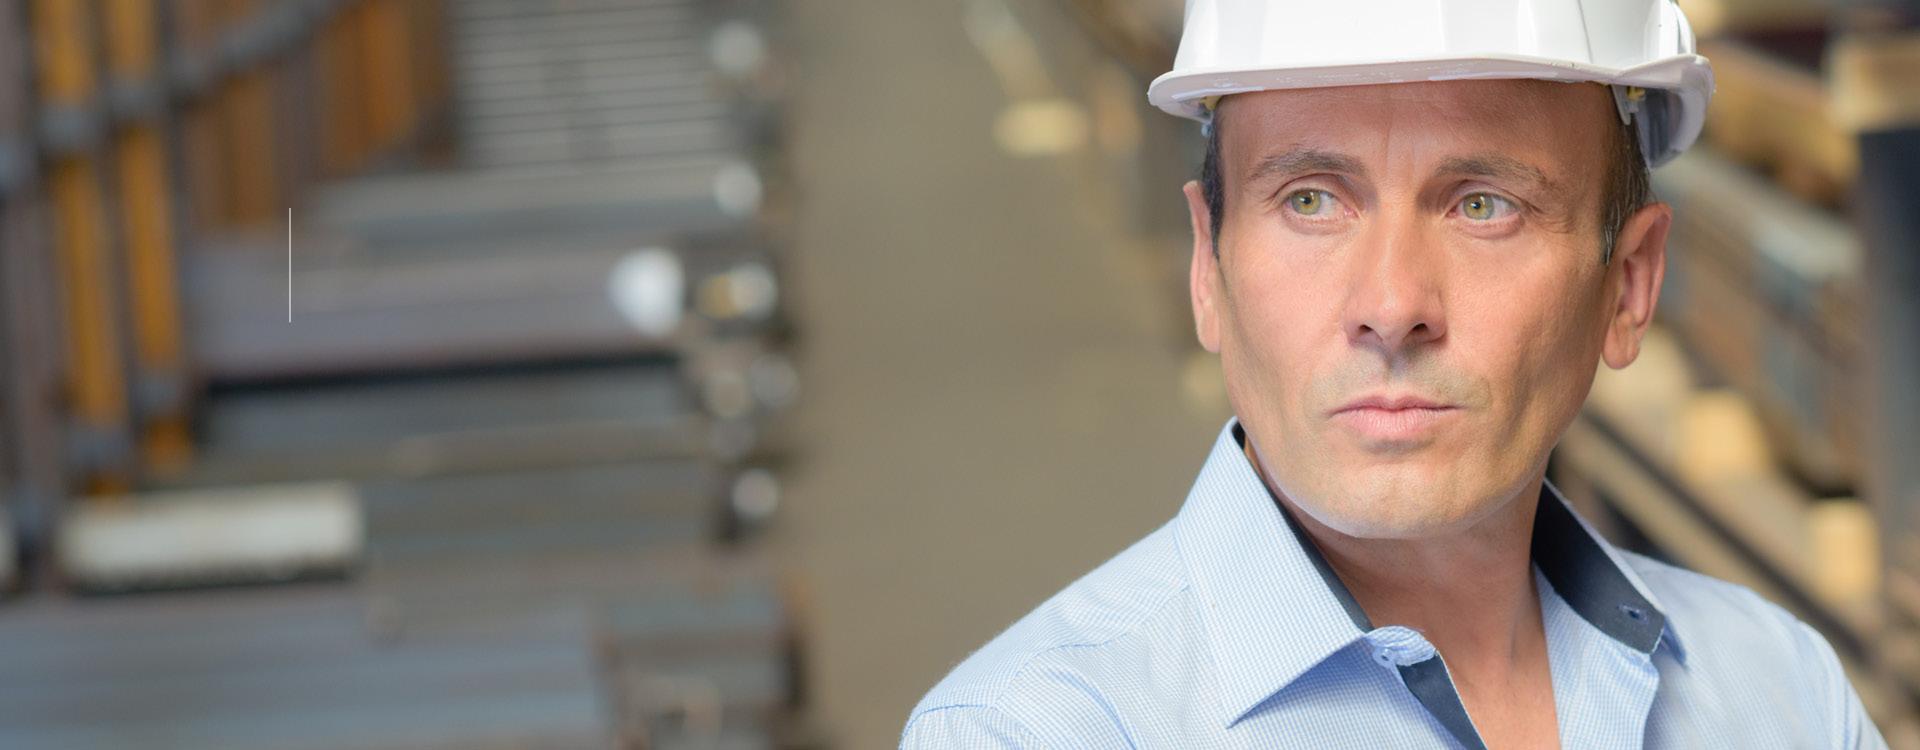 Industrie TCM _ Qualità e servizi